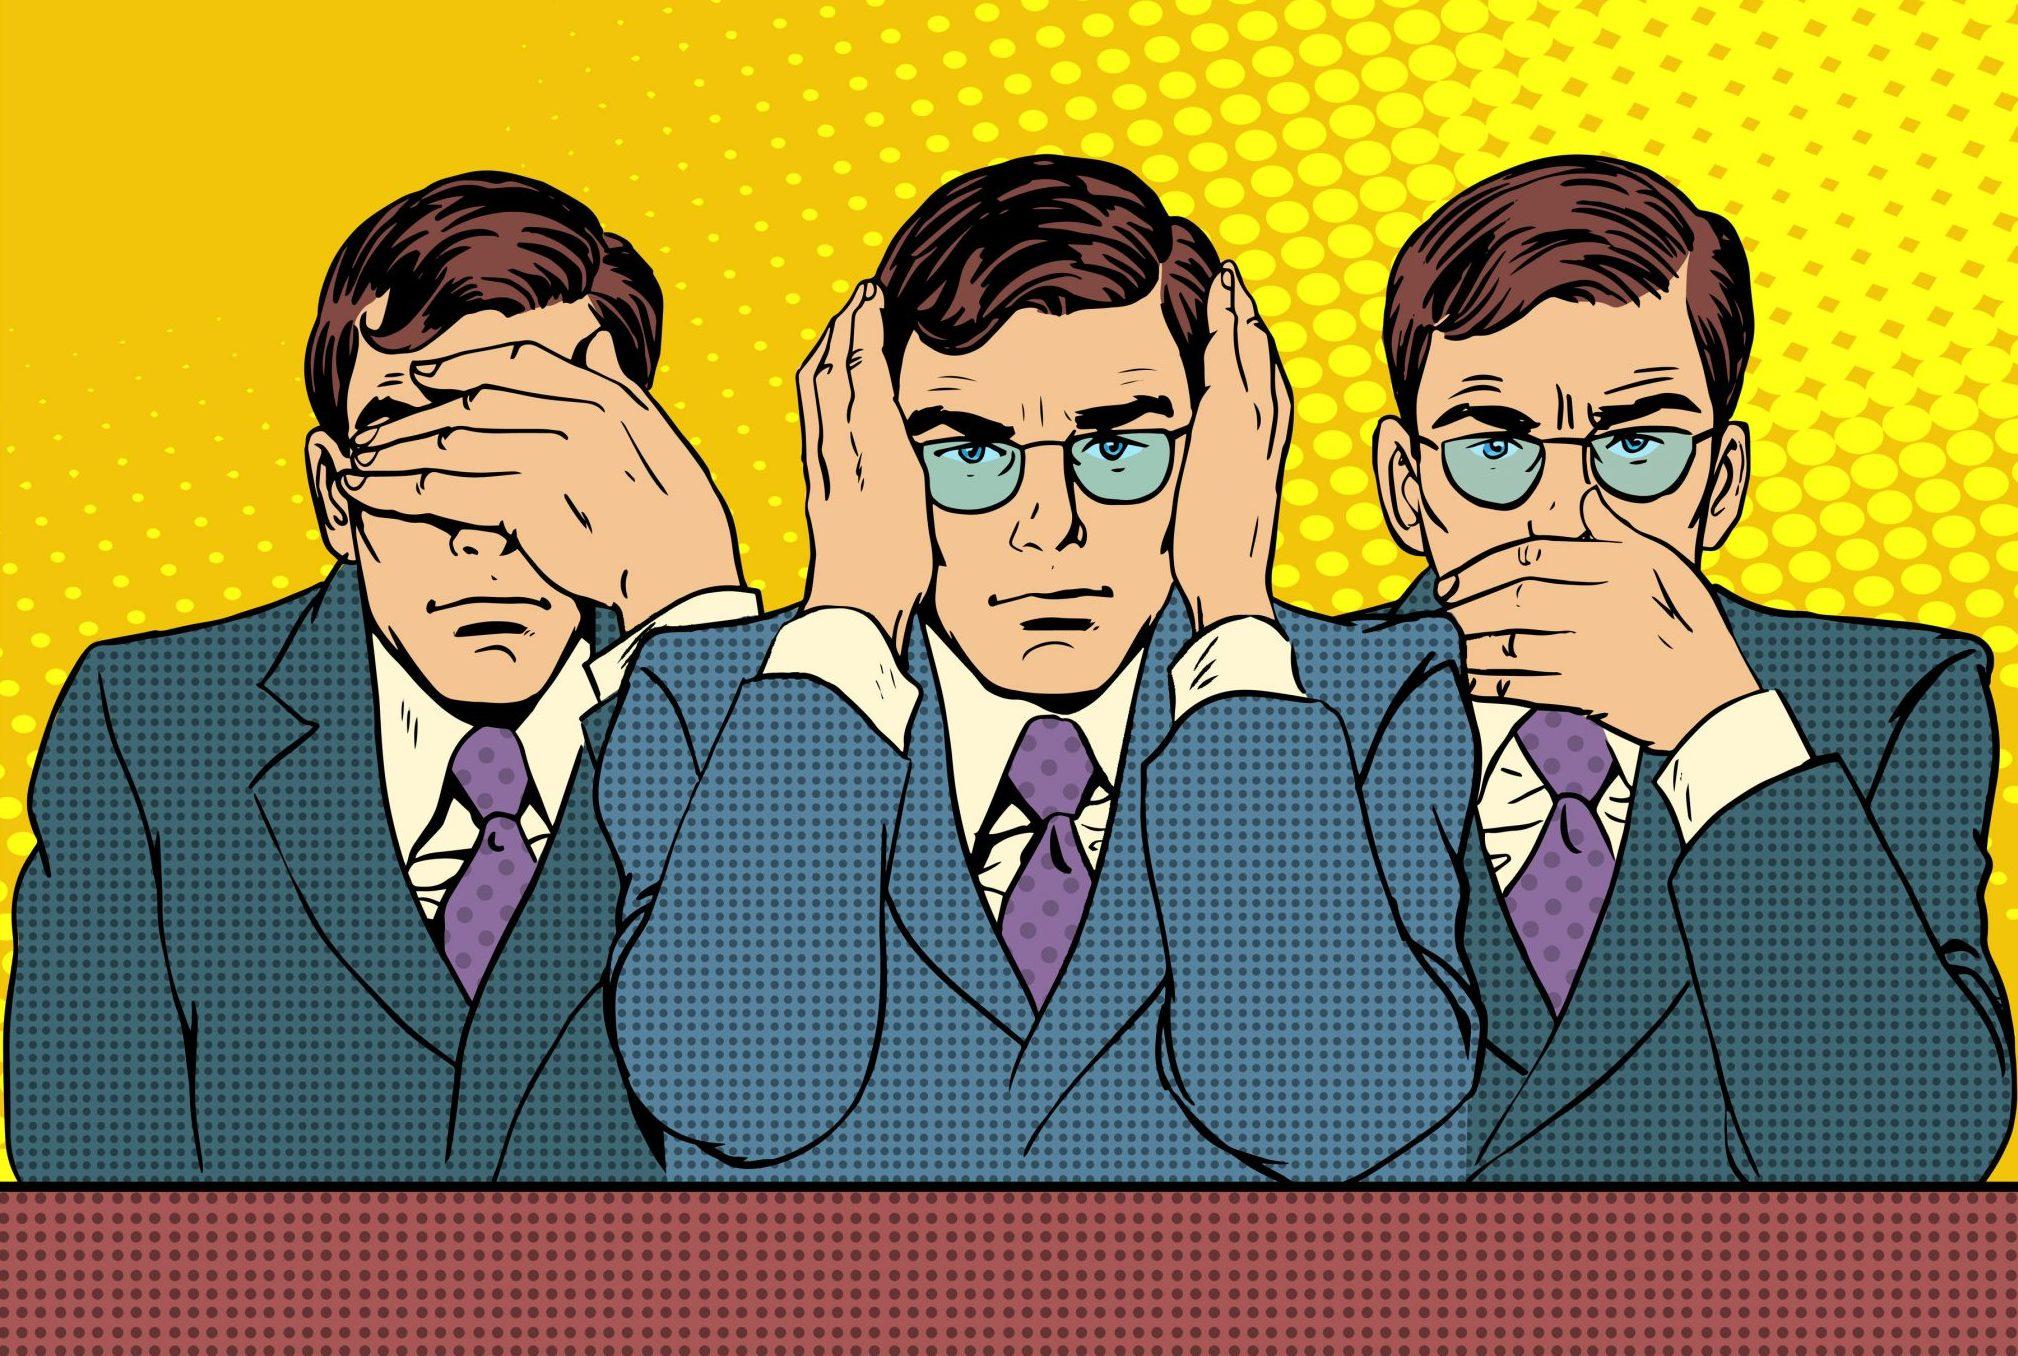 blind eye hear no evil see no evil speak no evil